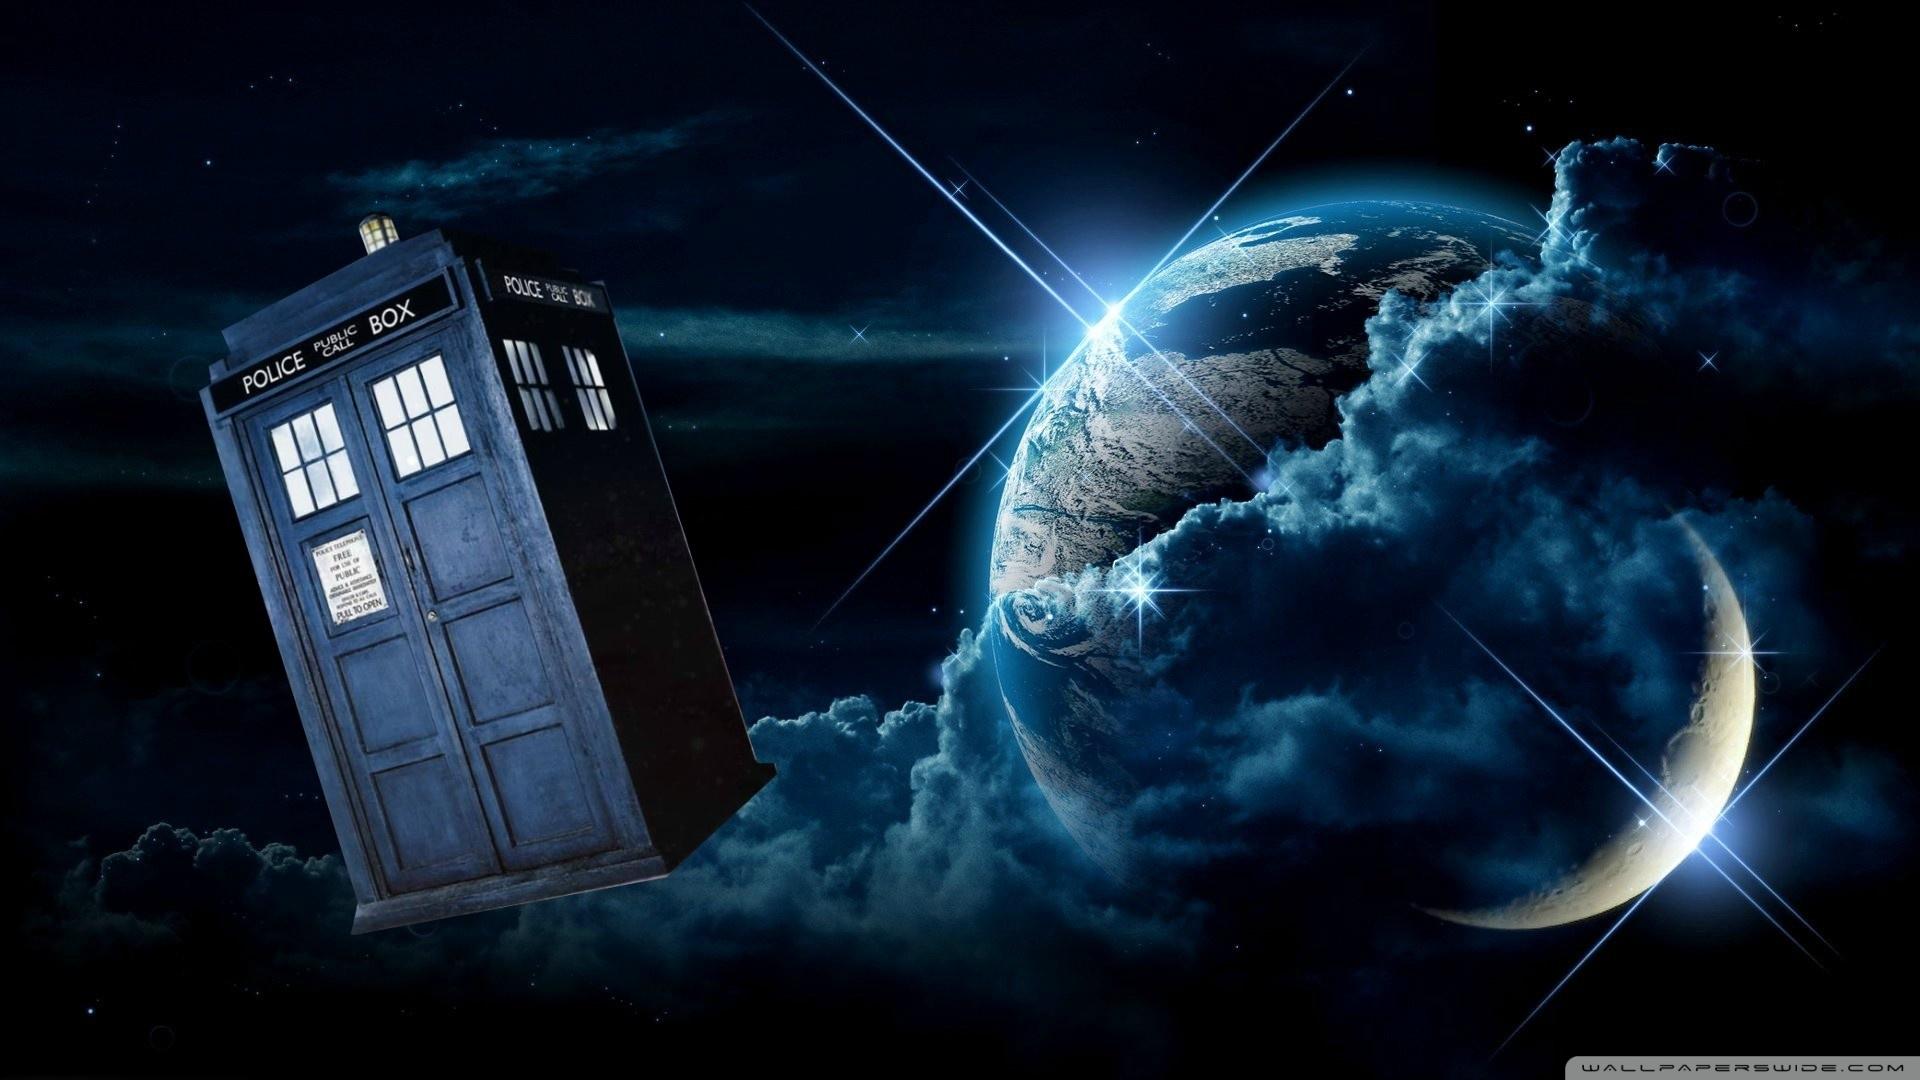 doctor who tardis ❤ 4k hd desktop wallpaper for 4k ultra hd tv